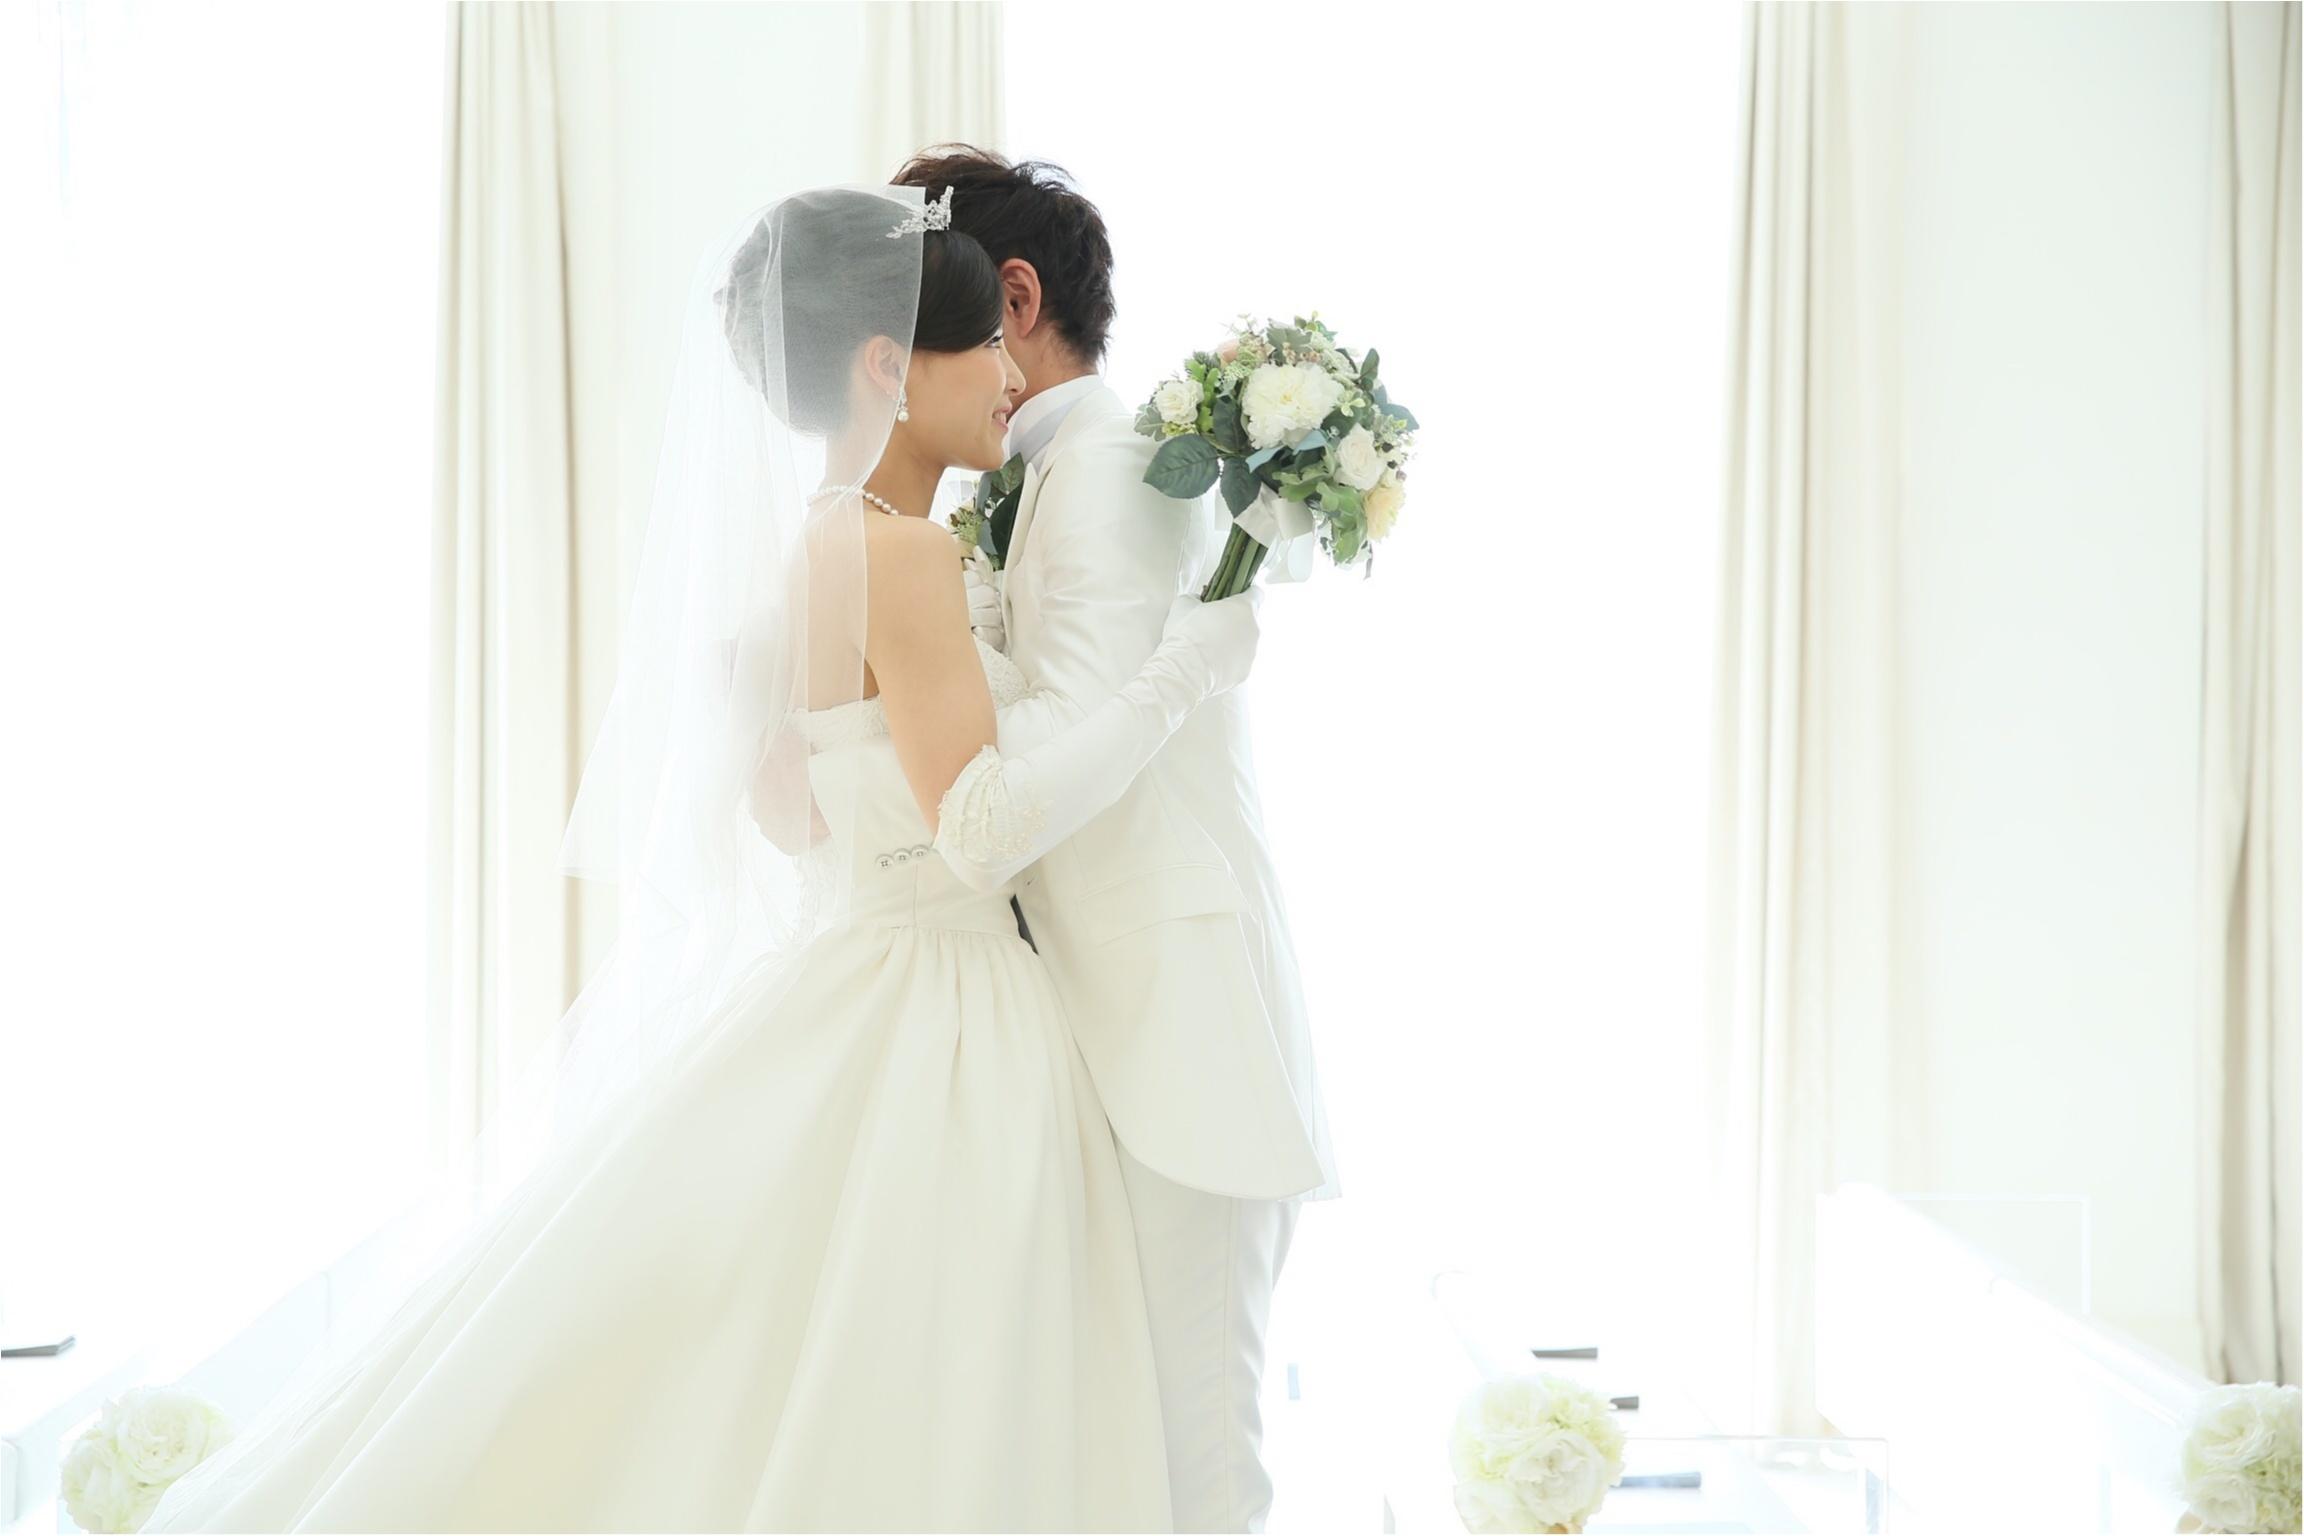 moco婚②▶︎まずは、ドキドキのファーストミート♡♡そこでなんと……_4